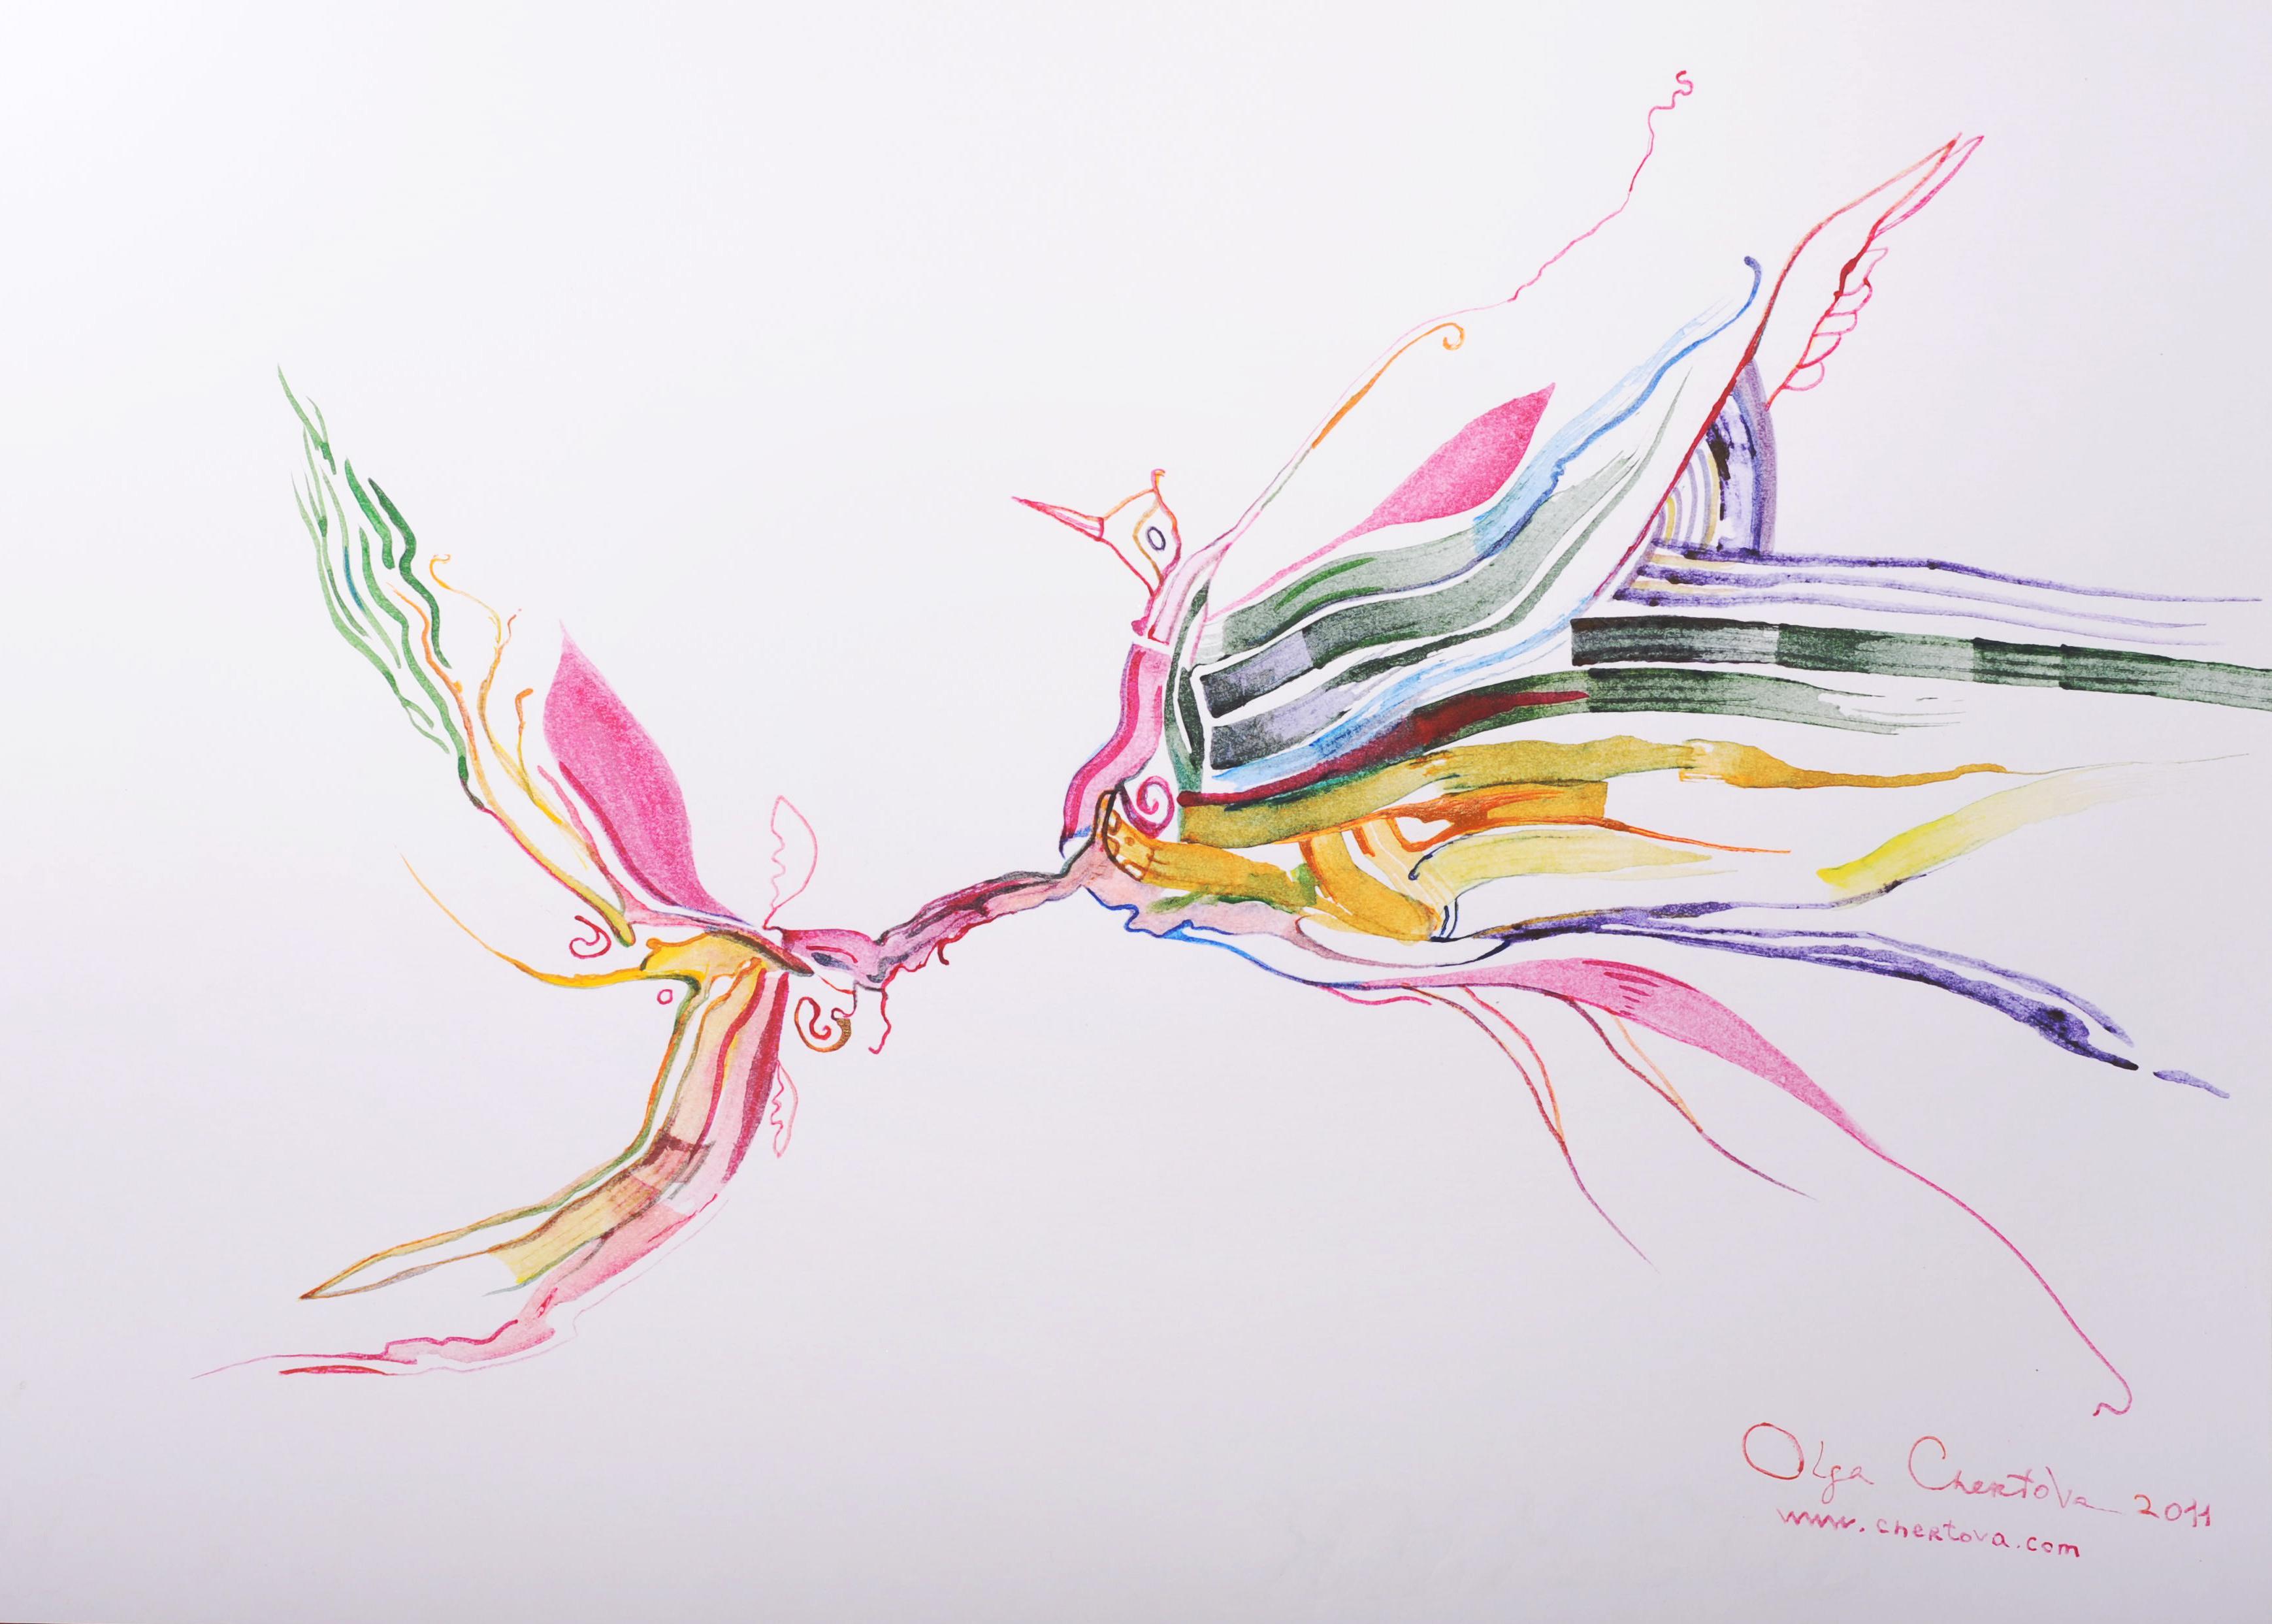 Metamorphosis by Olga Chertova